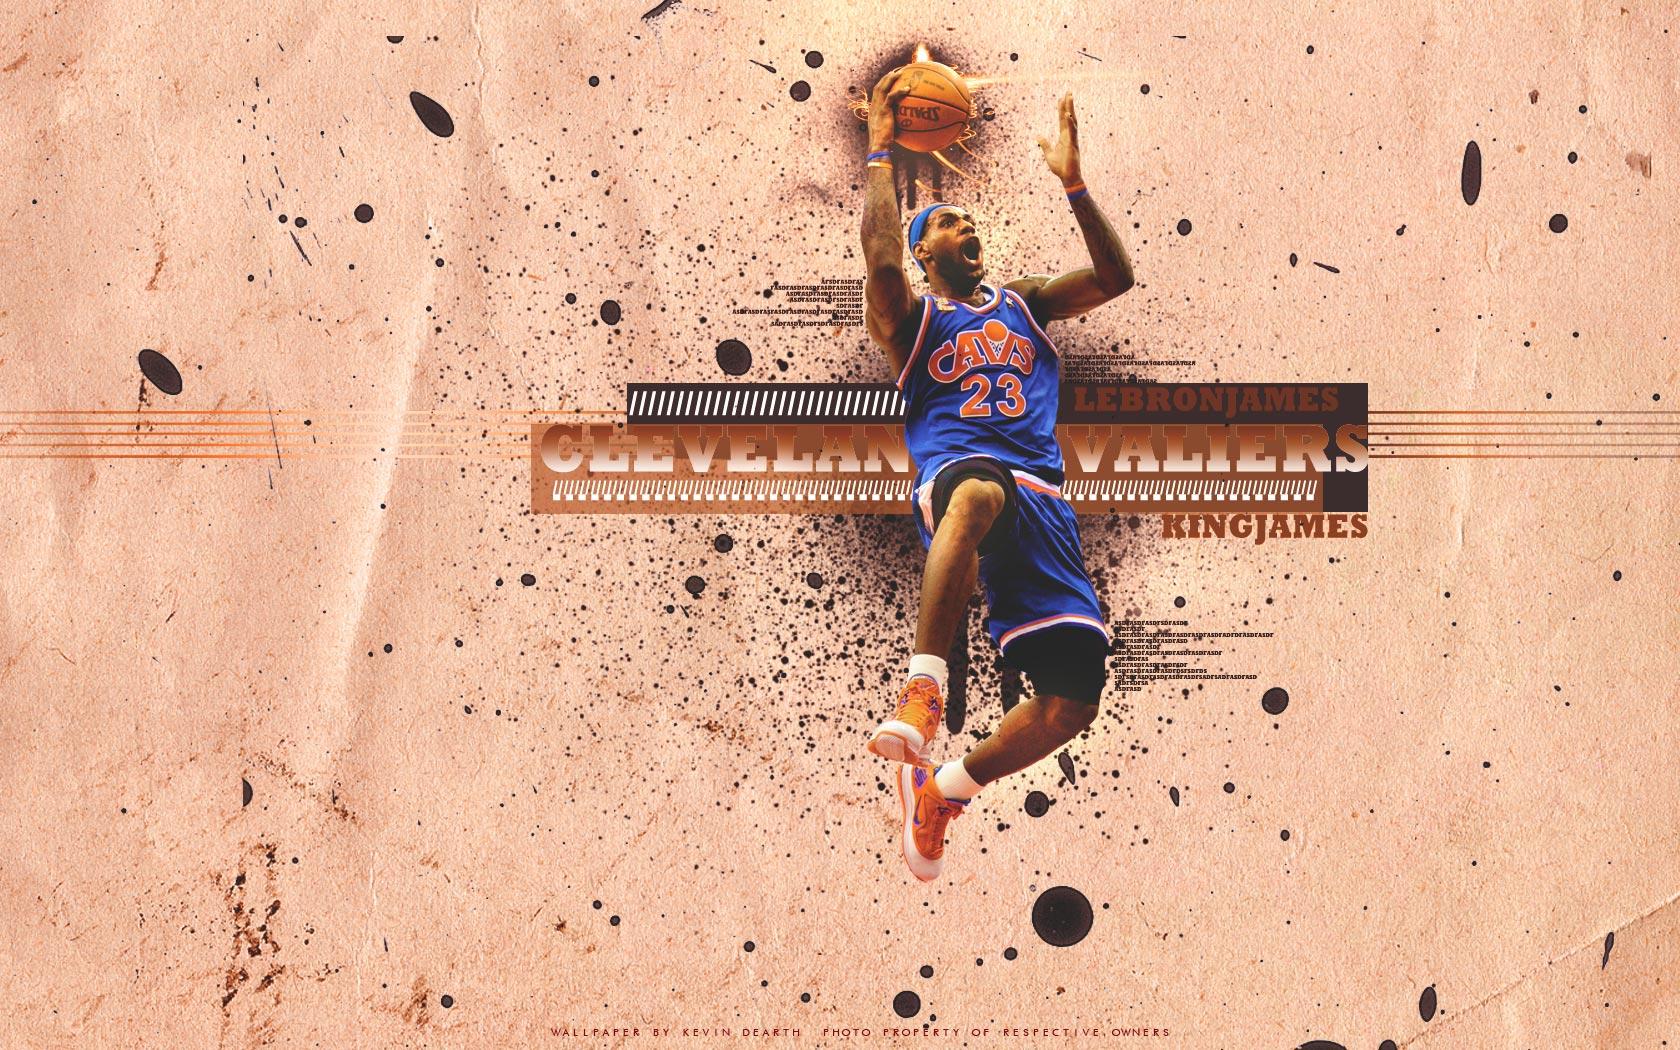 LeBron James Unstoppable Dunk Widescreen Wallpaper Basketball 1680x1050